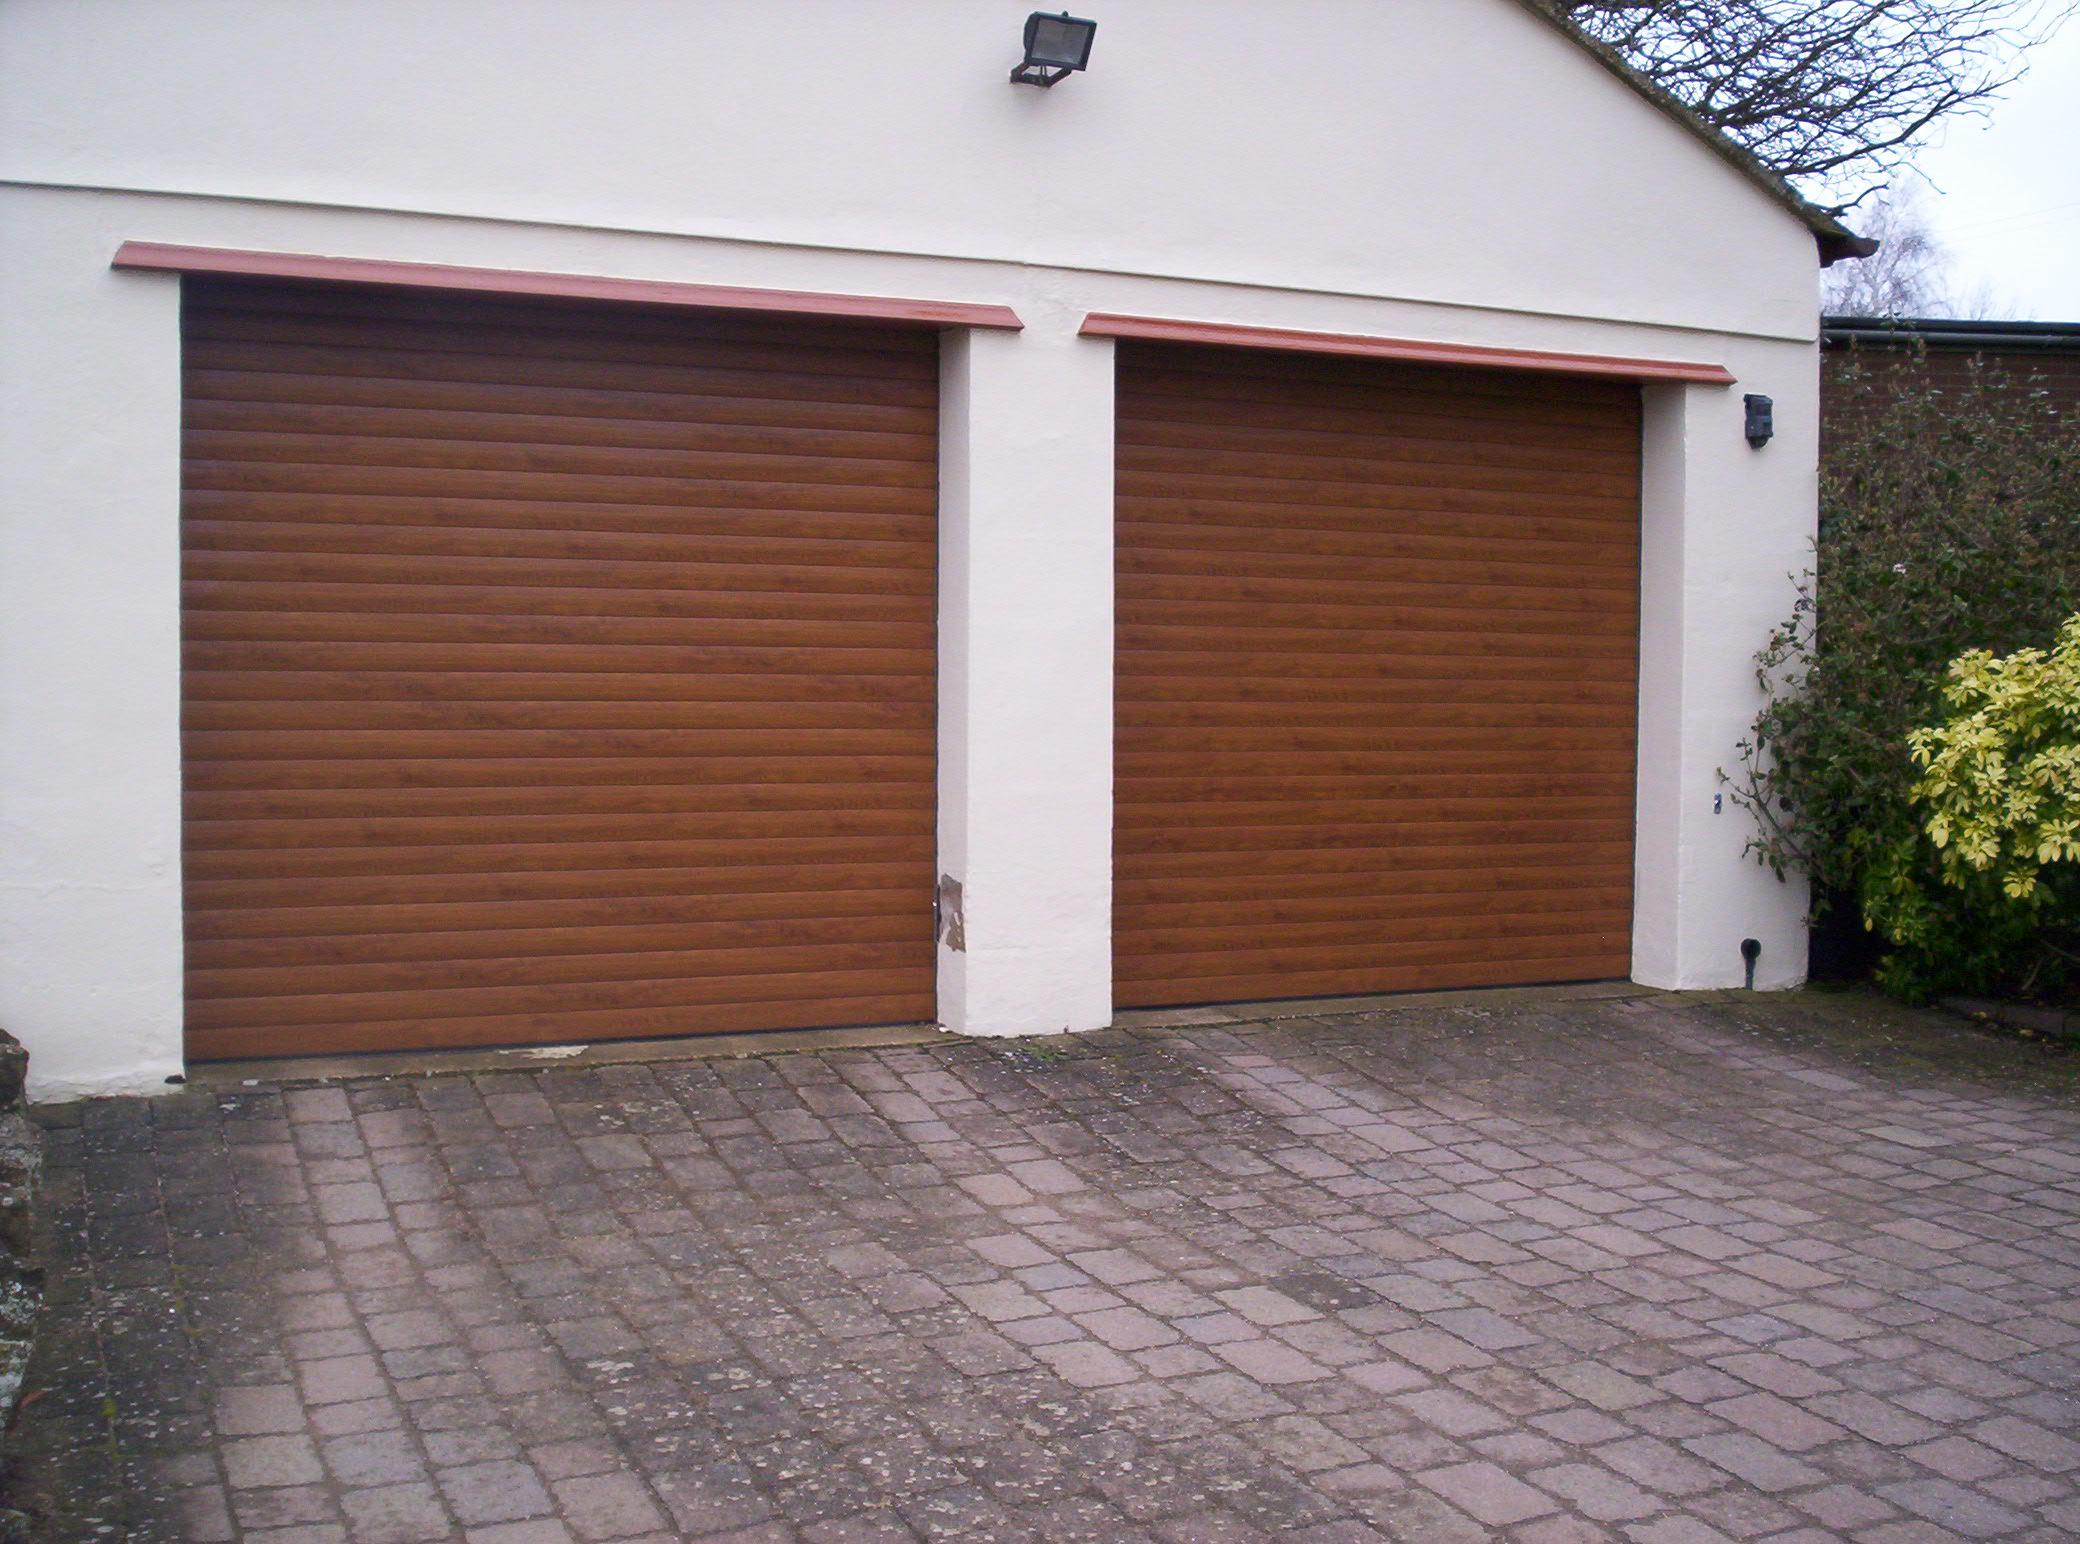 Buckle jones garage doors newcastle garage doors hexham buckle jones garage doors newcastle garage doors hexham garage doors carlisle garage doors north east rubansaba